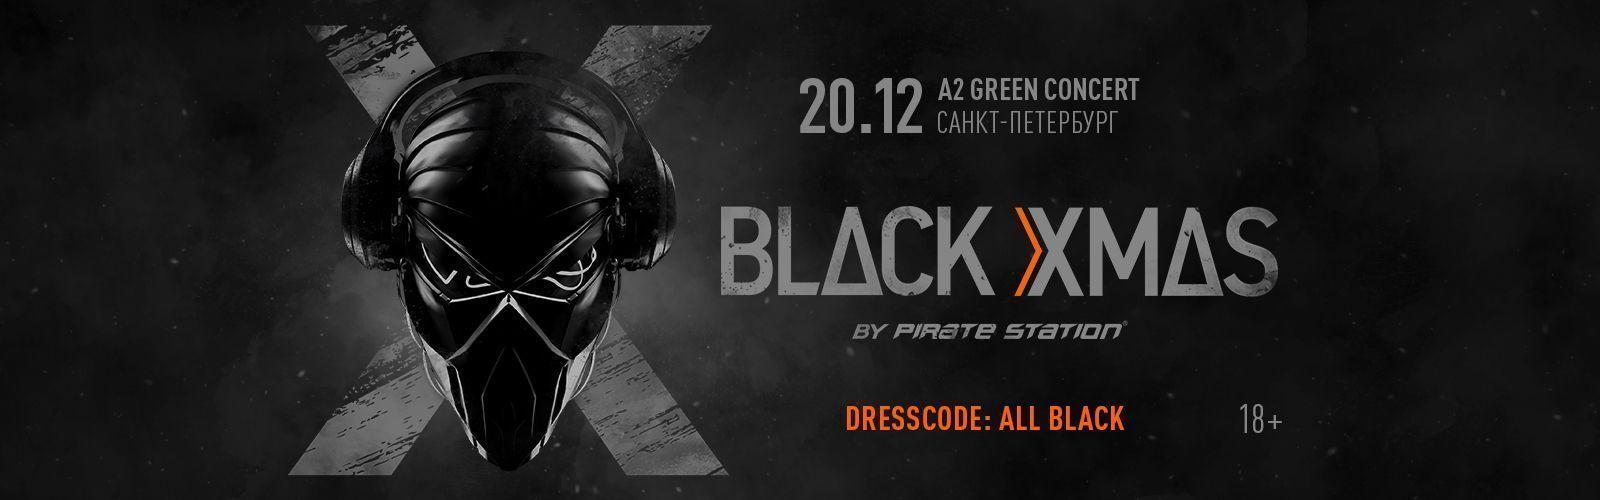 a6e08761f24c0 «Record Black X-Mas by Pirate Station» - купить билеты онлайн | 20 декабря  2019 23:30, A2 Green Concert, Санкт-Петербург